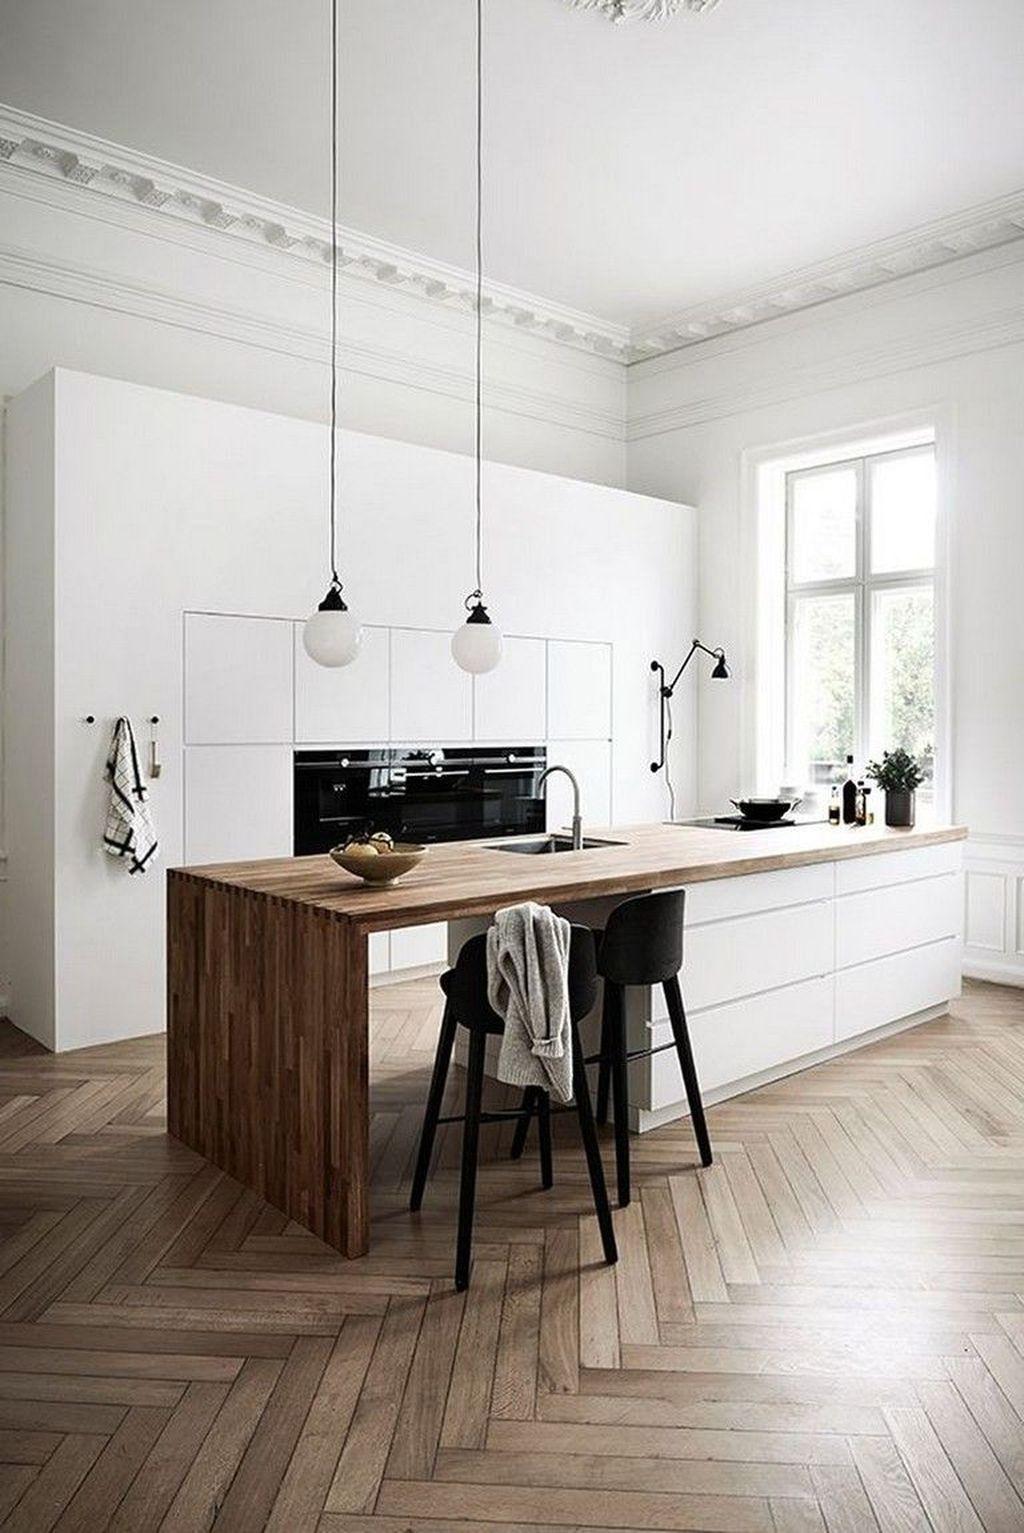 36 Great Modern Scandinavian Kitchen Design Ideas To Inspire You